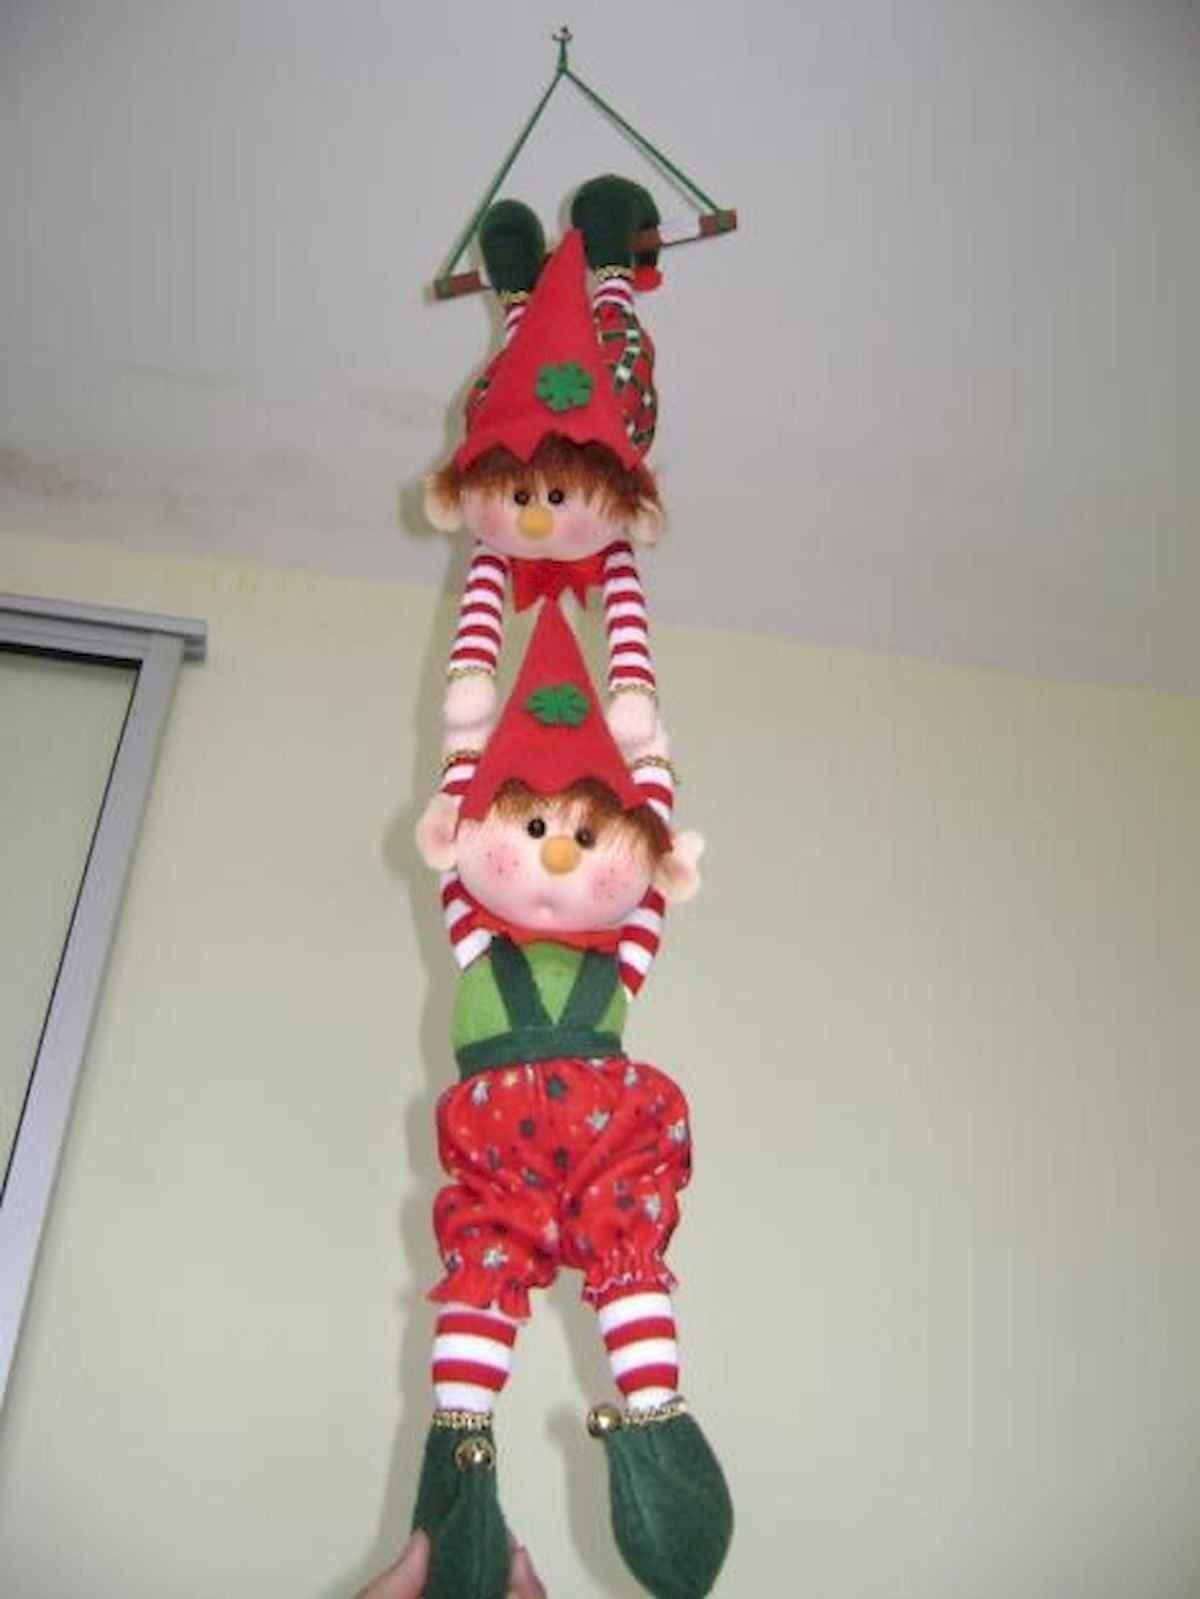 40 unique christmas tree ideas decorations (23)